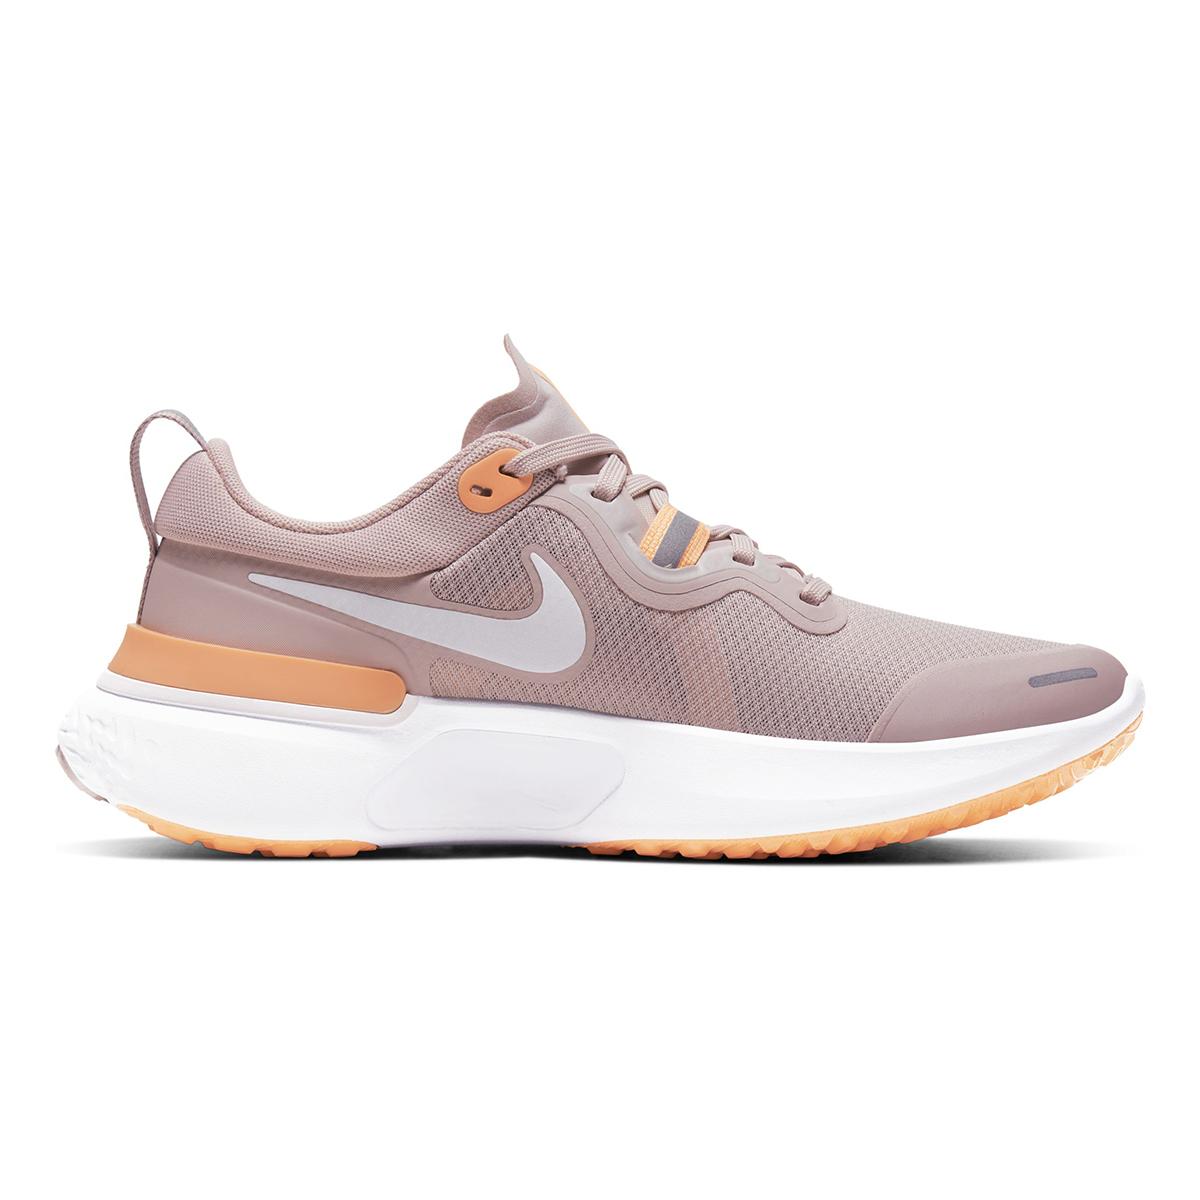 Women's Nike React Miler Running Shoe - Color: Champagne/Orange Pulse/Barely Rose/White (Regular Width) - Size: 5, Champagne/Orange Pulse/Barely Rose/White, large, image 1